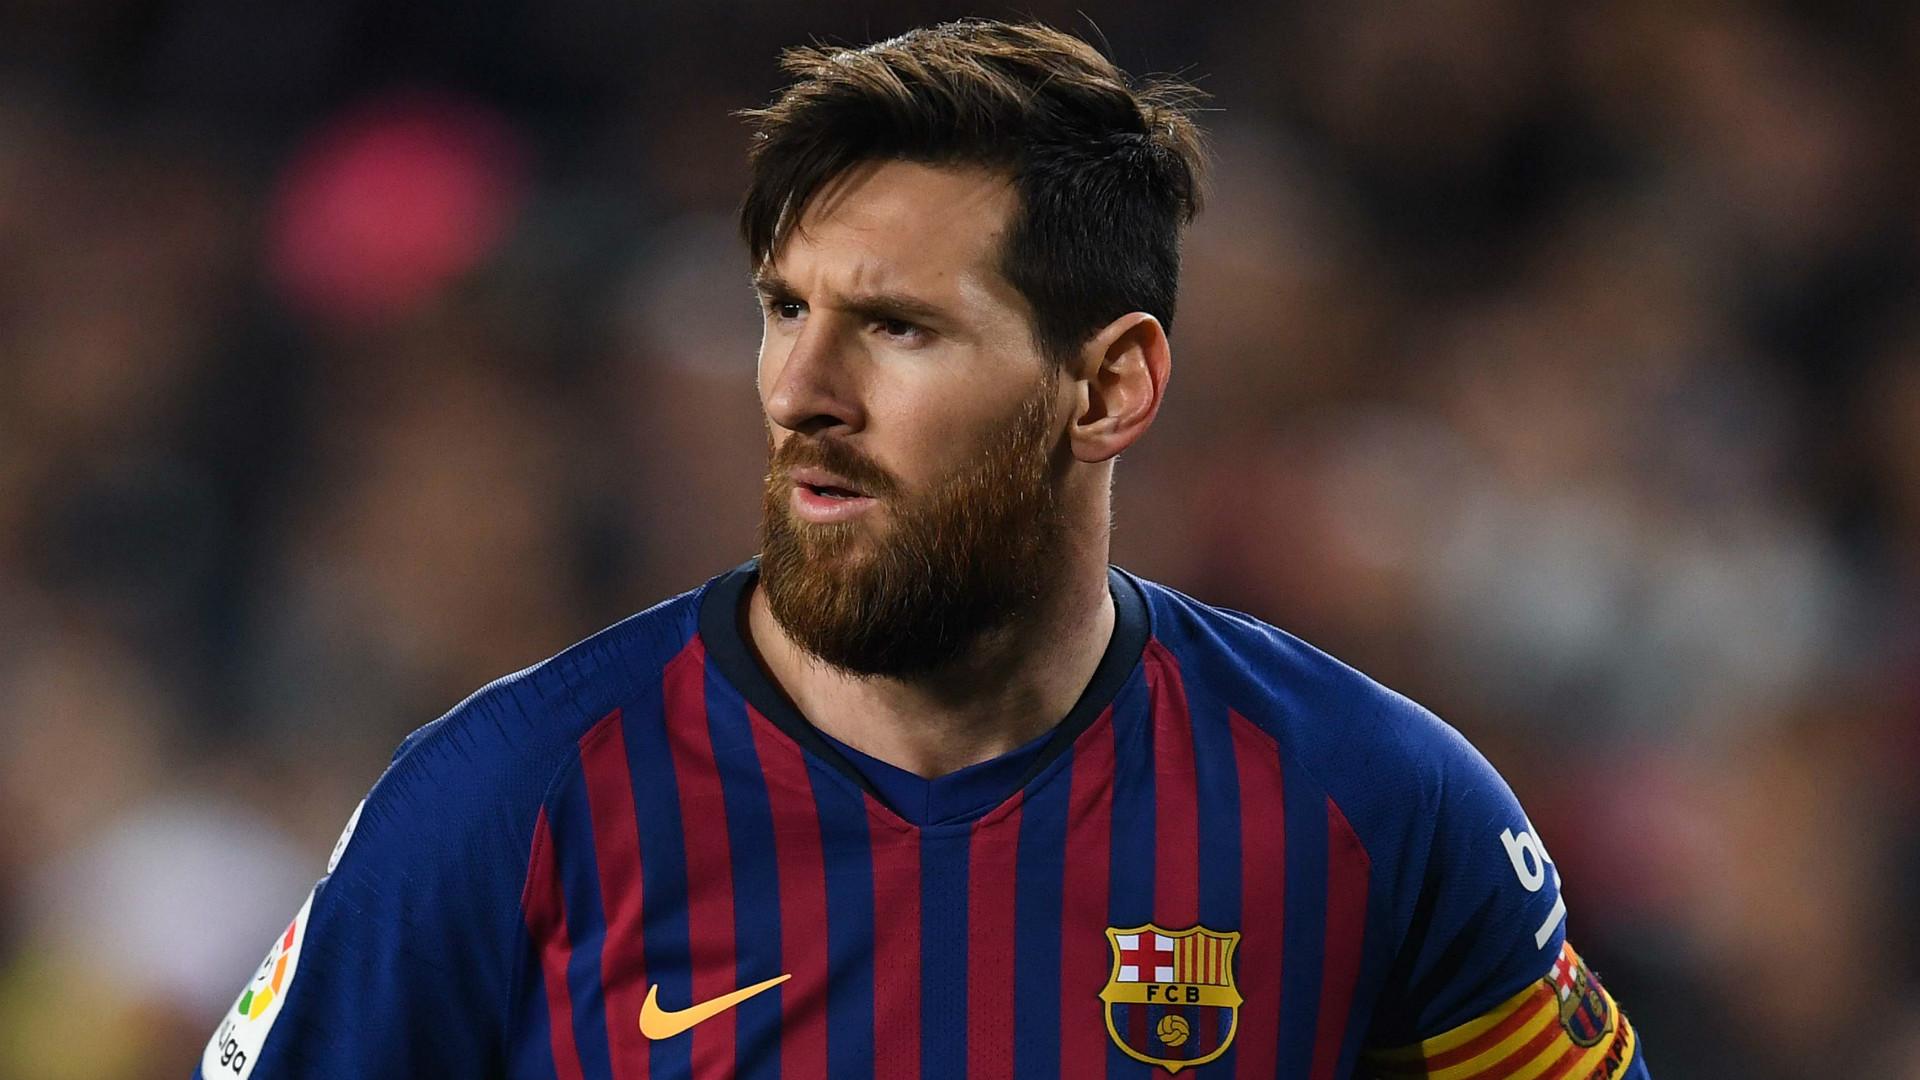 L Messi